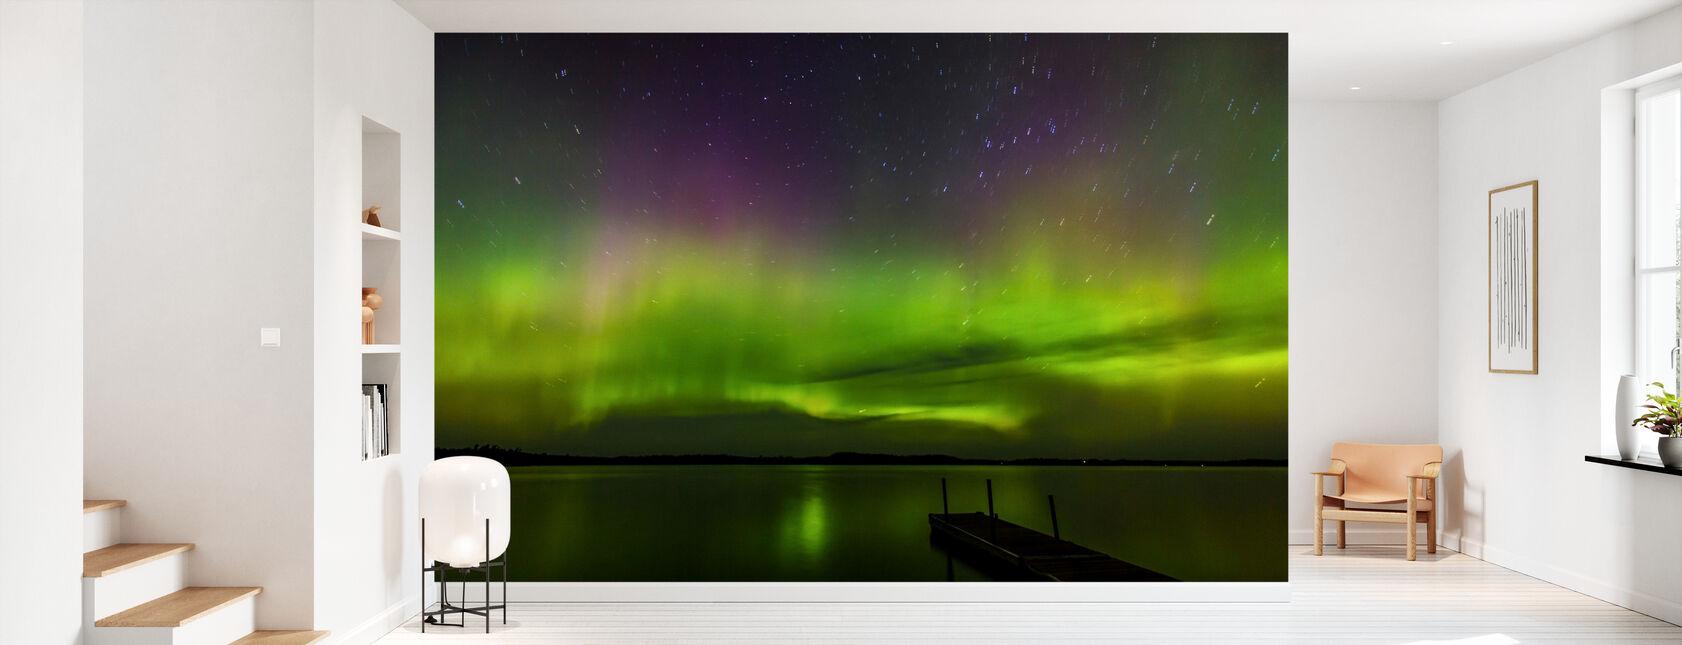 Aurora Borealis over Burntside Lake - Wallpaper - Hallway